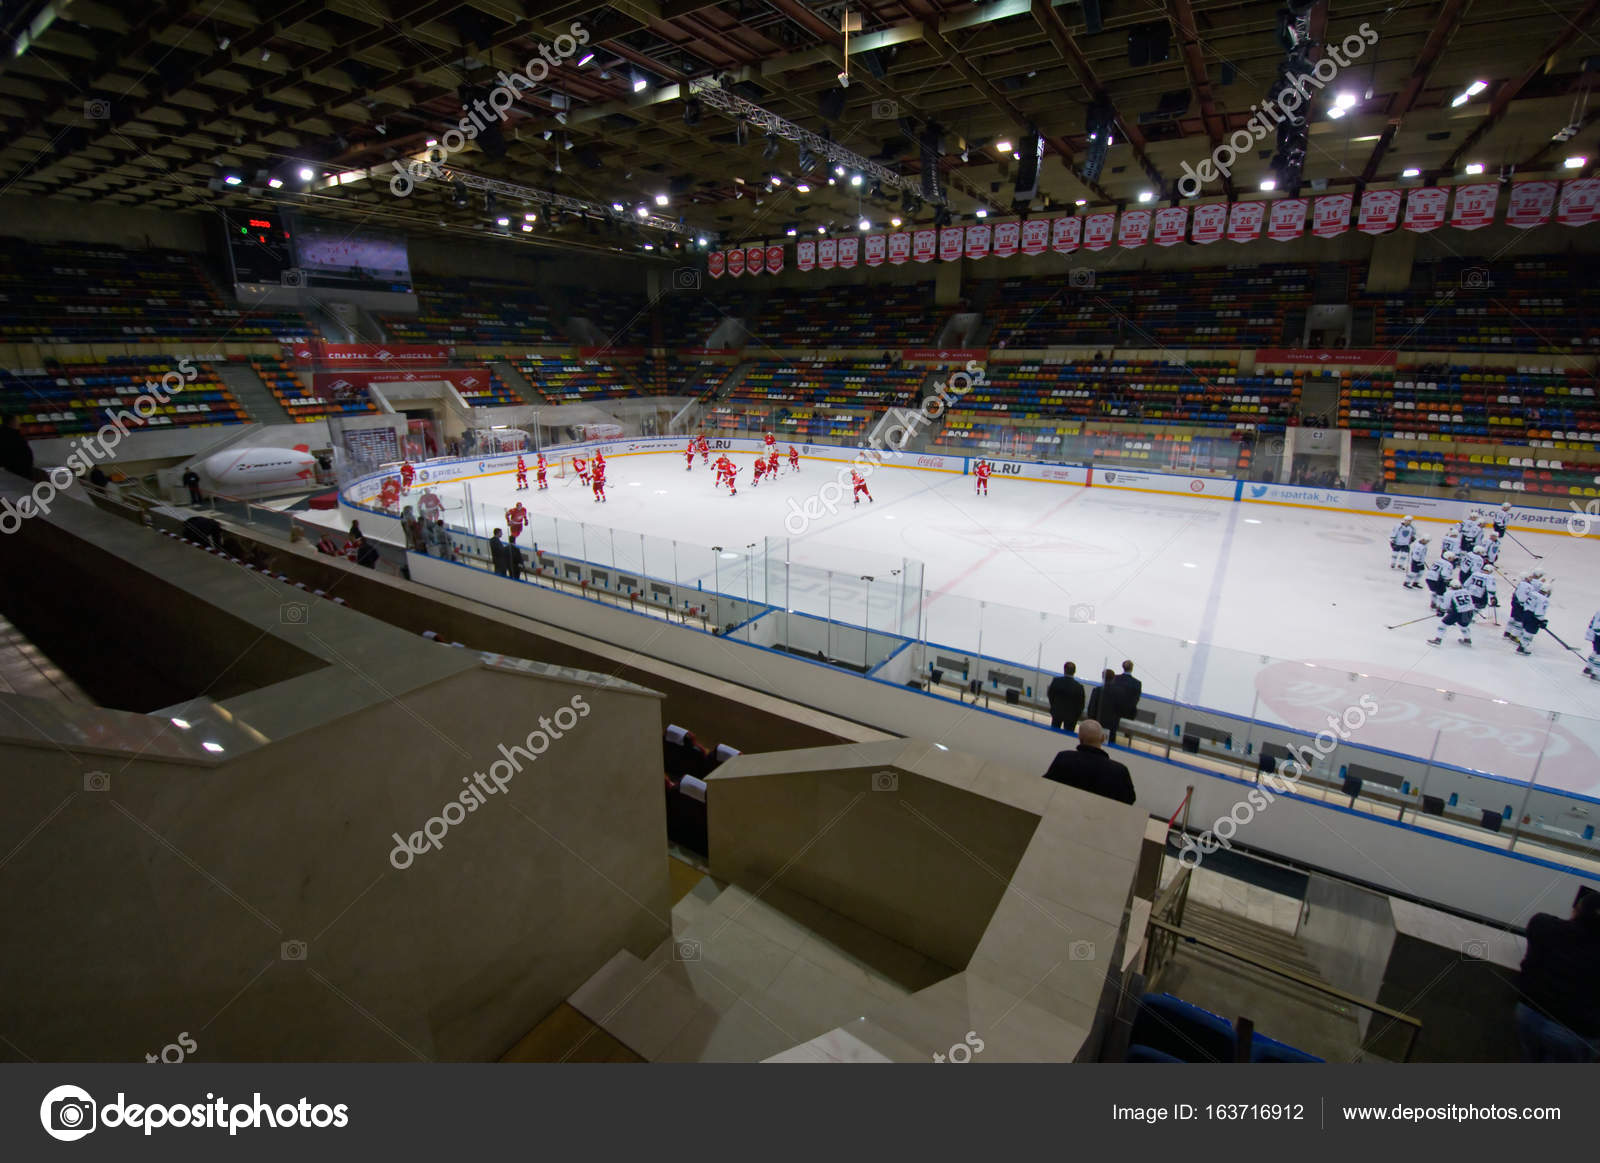 Stunning Ice Interieur fotos - Ideeën & Huis inrichten ...